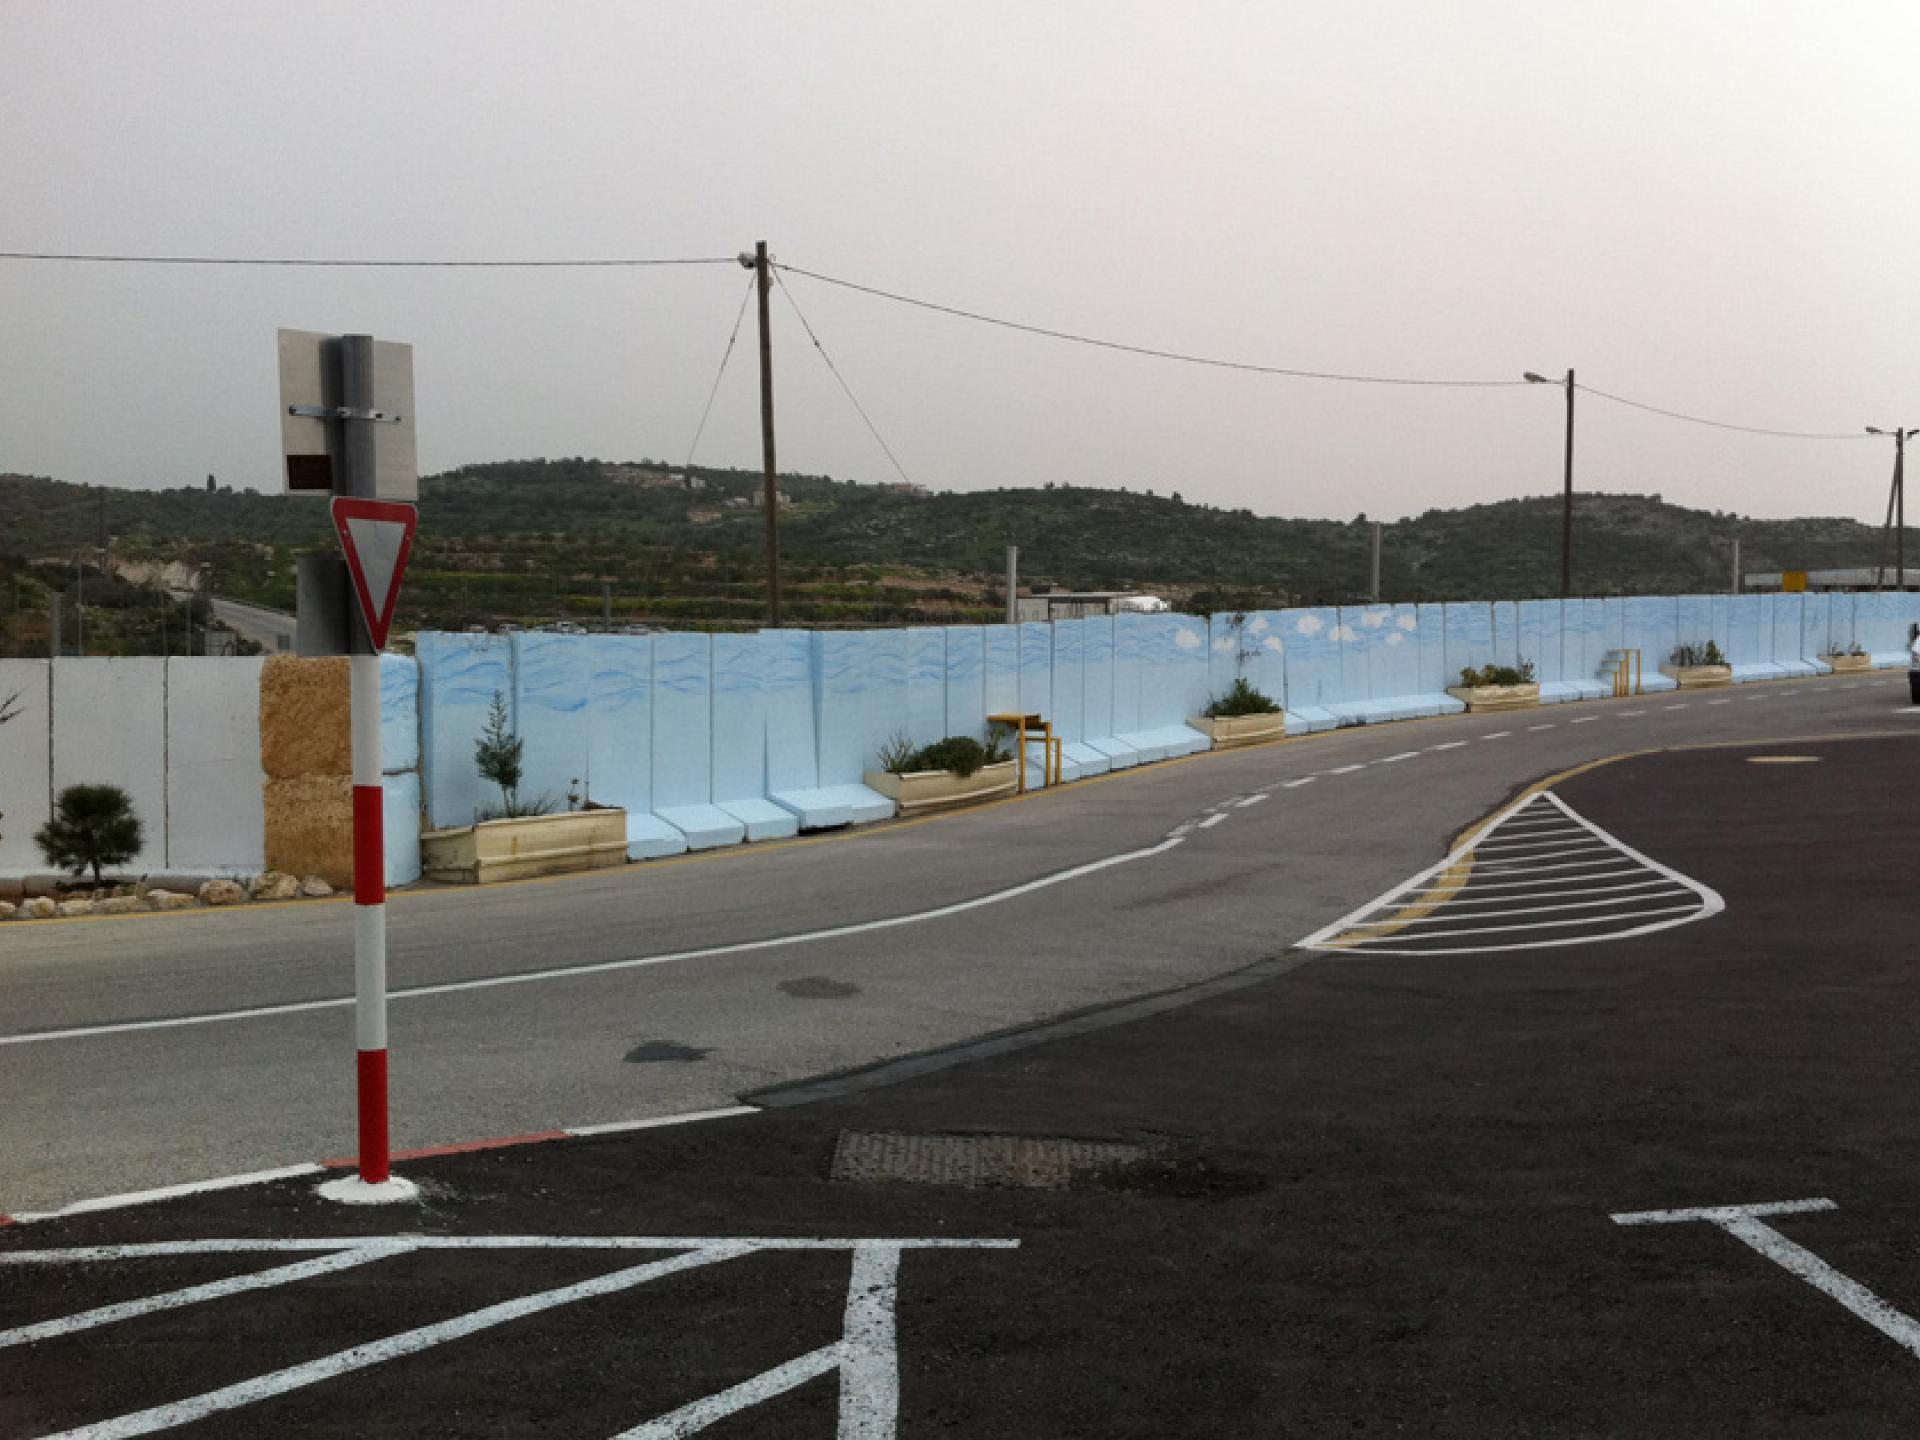 Barta'a/Reikhan checkpoint 25.03.12